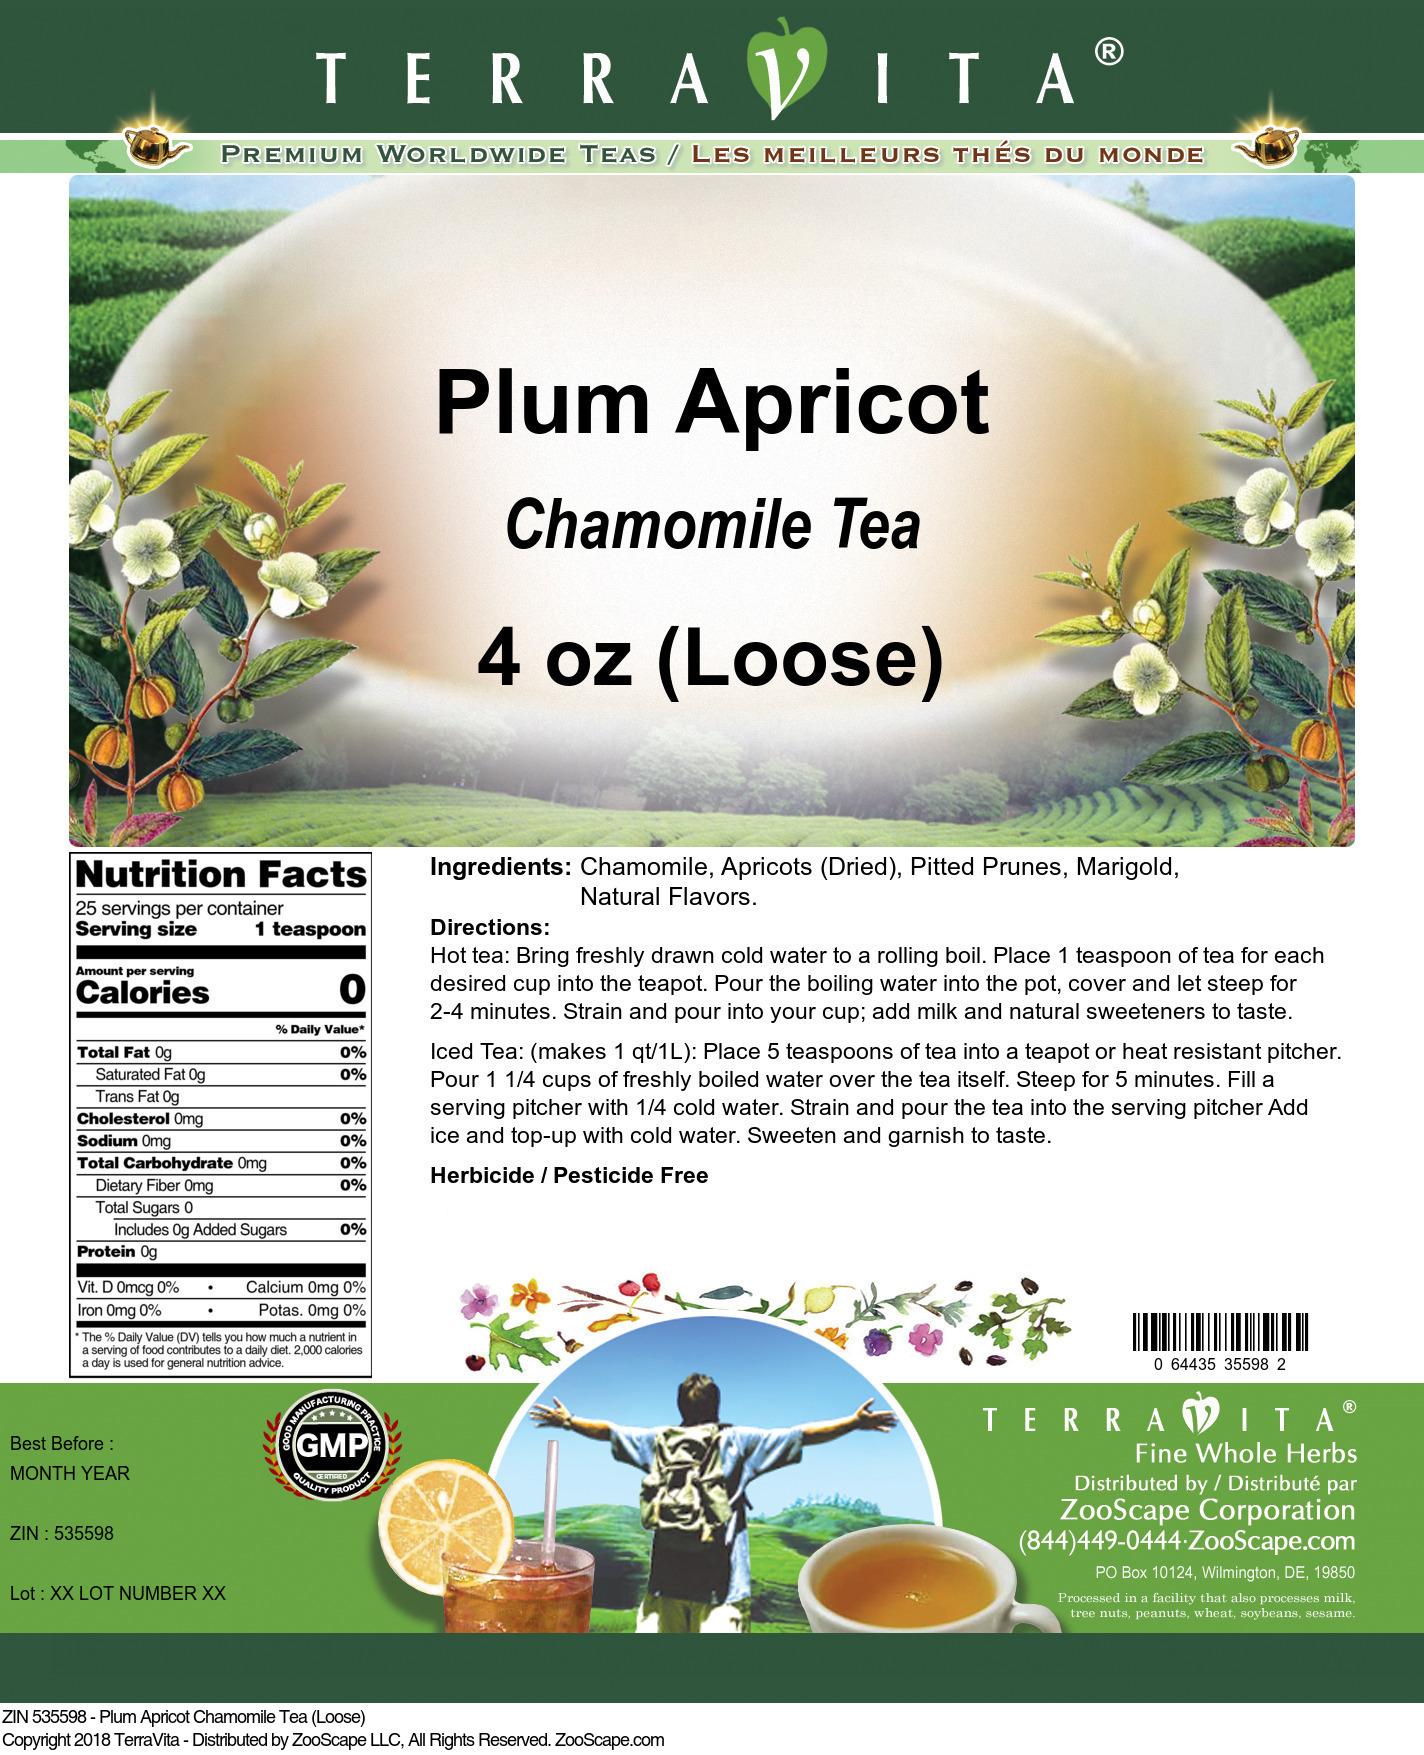 Plum Apricot Chamomile Tea (Loose)